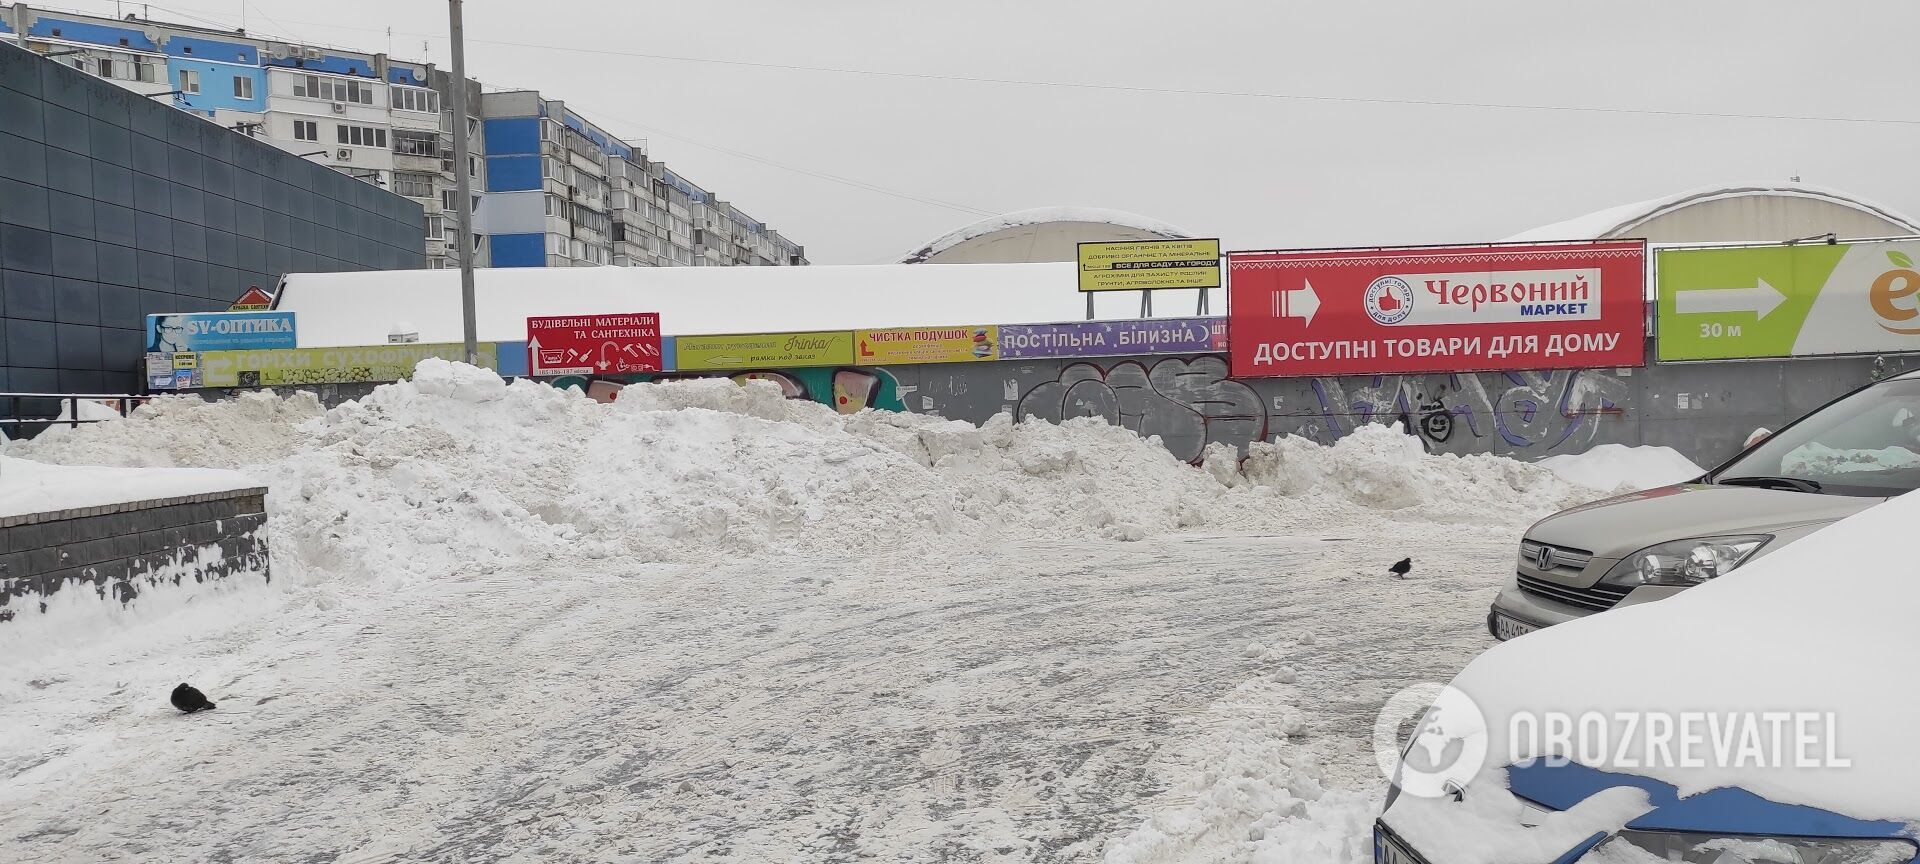 На Троещине снег со стоянки у магазина сбросили возле рынка.